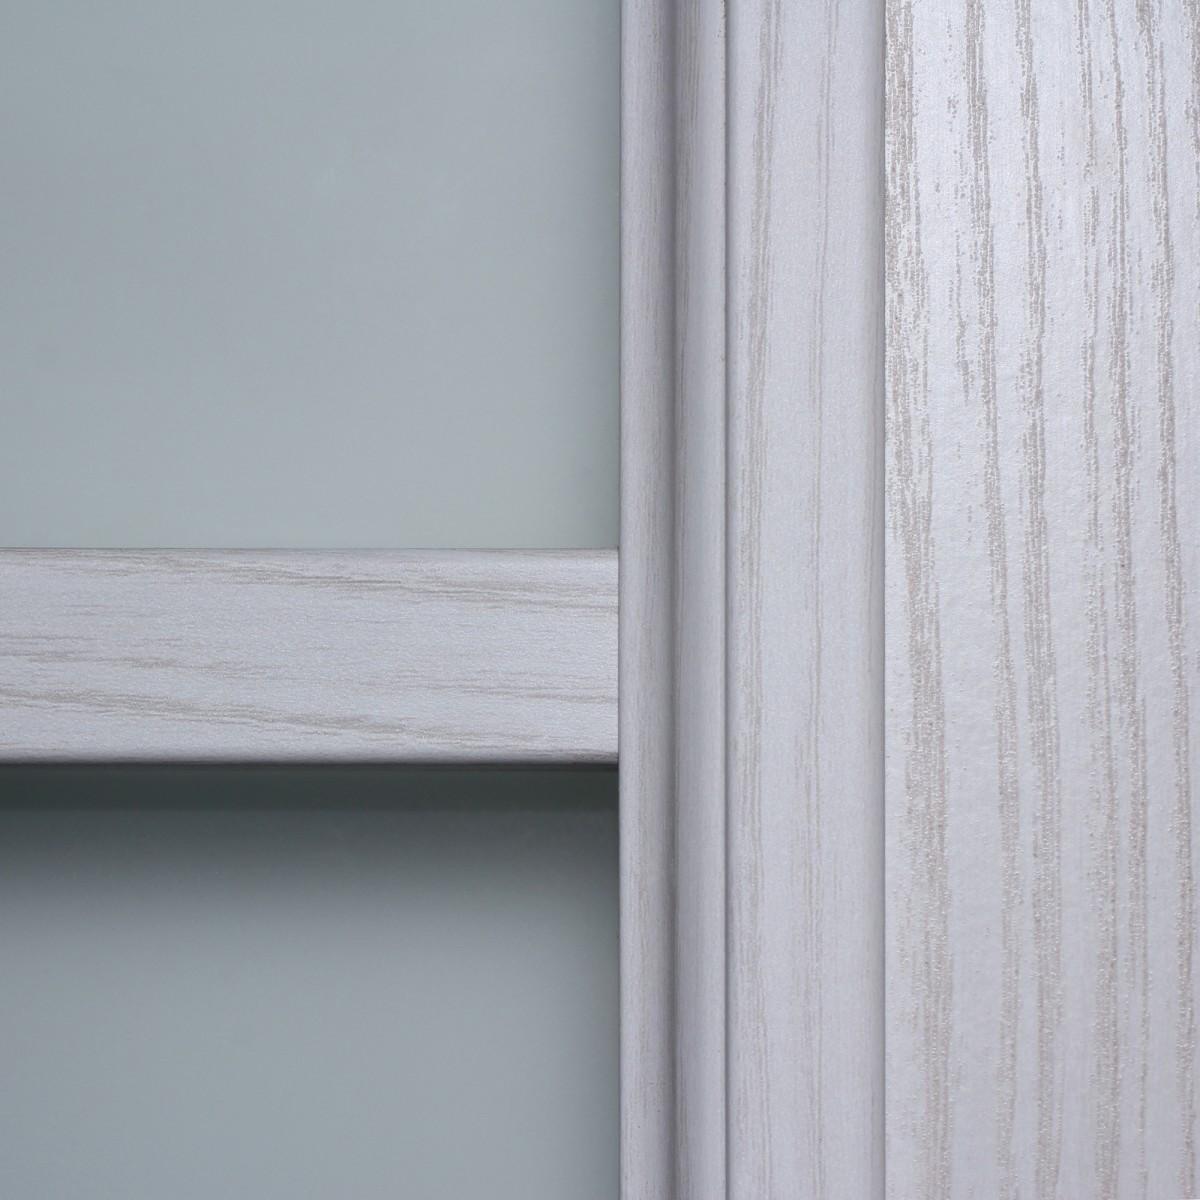 Дверь Межкомнатная Остеклённая Провенца 80x200 Цвет